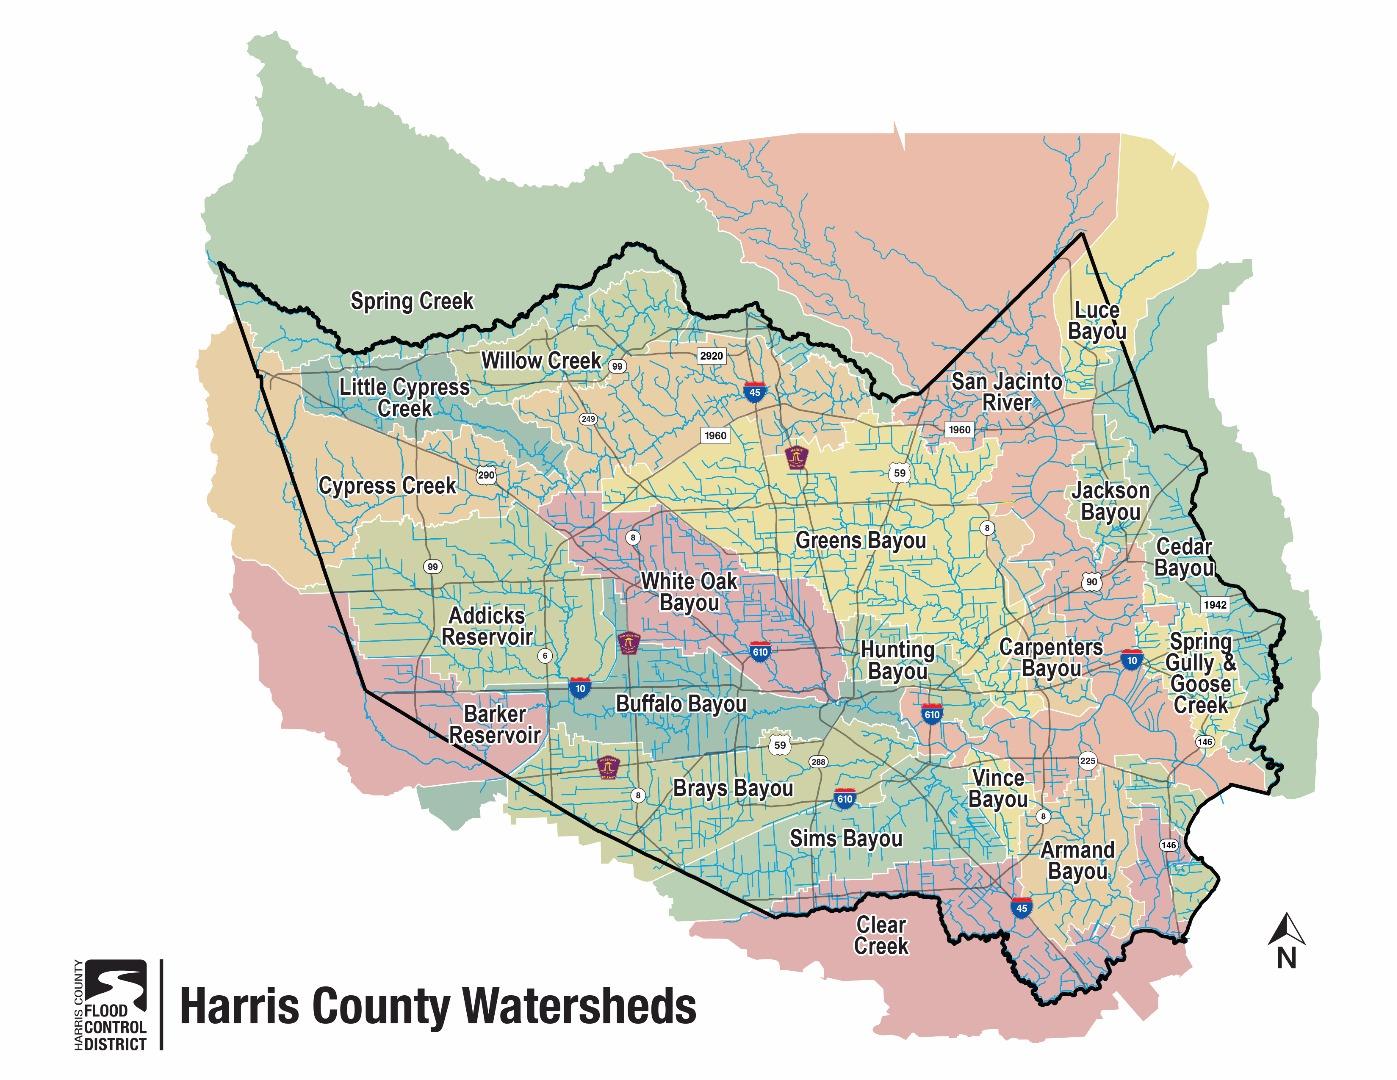 Watershed Maps | Save Buffalo Bayou